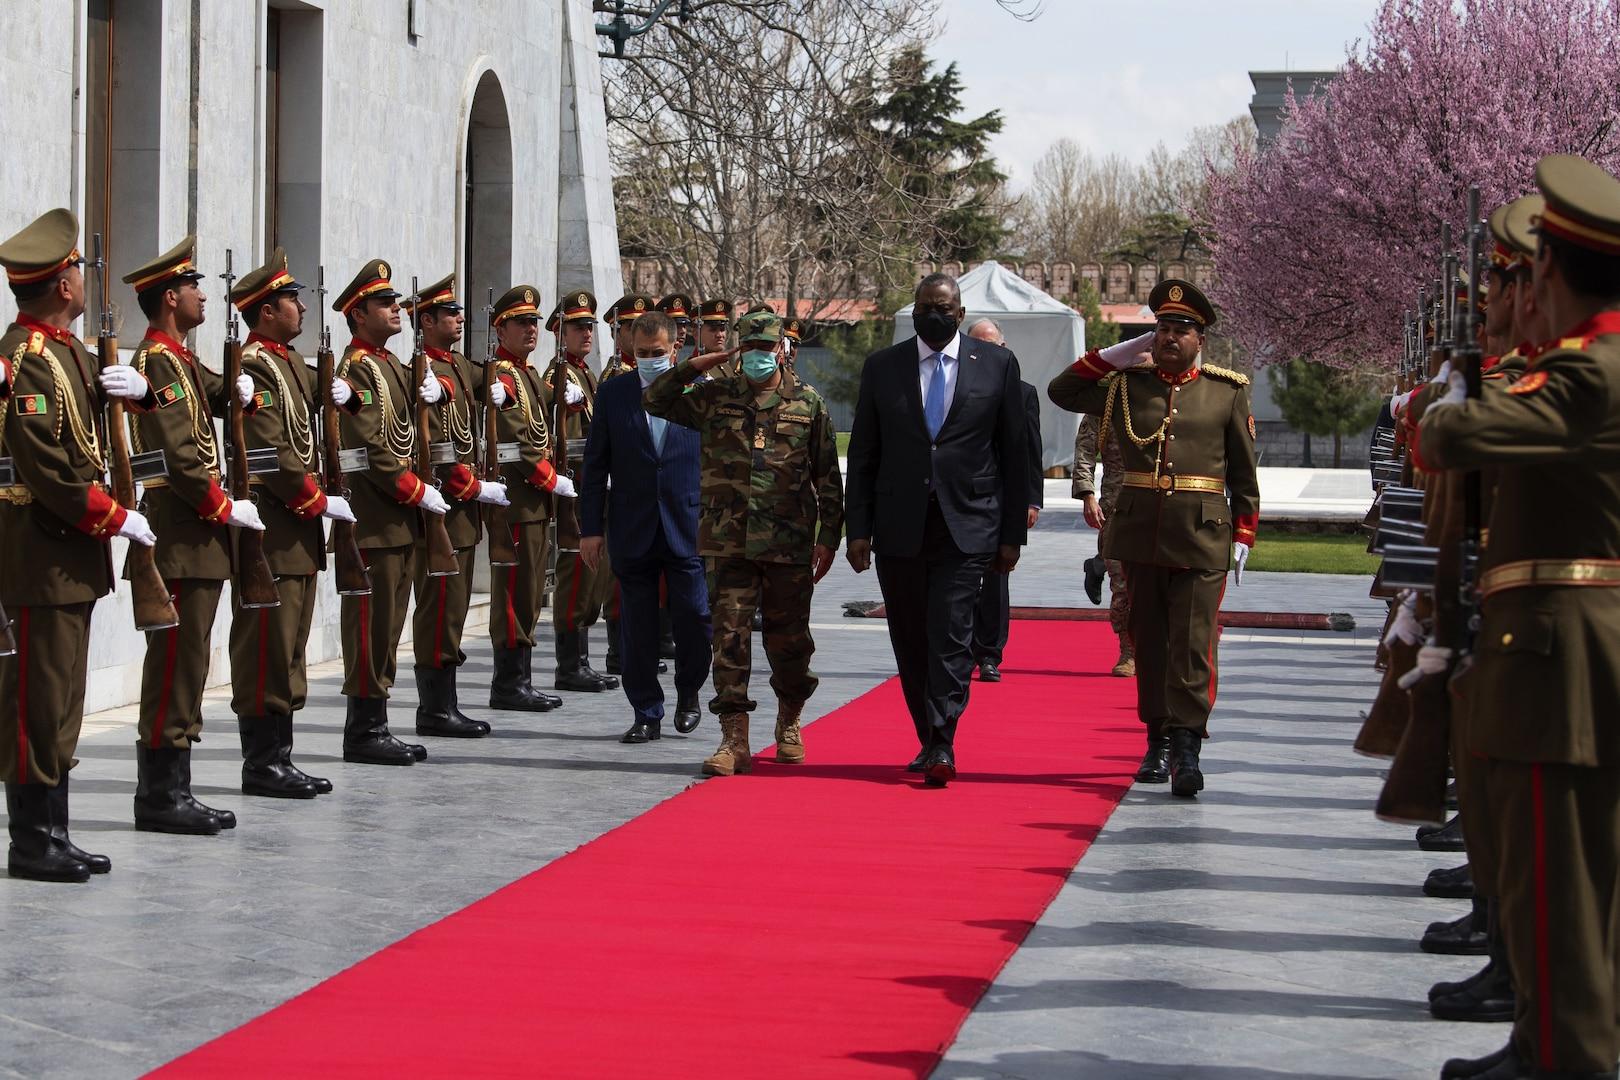 Defense Secretary Lloyd J. Austin III walks along a red carpet with military officials.